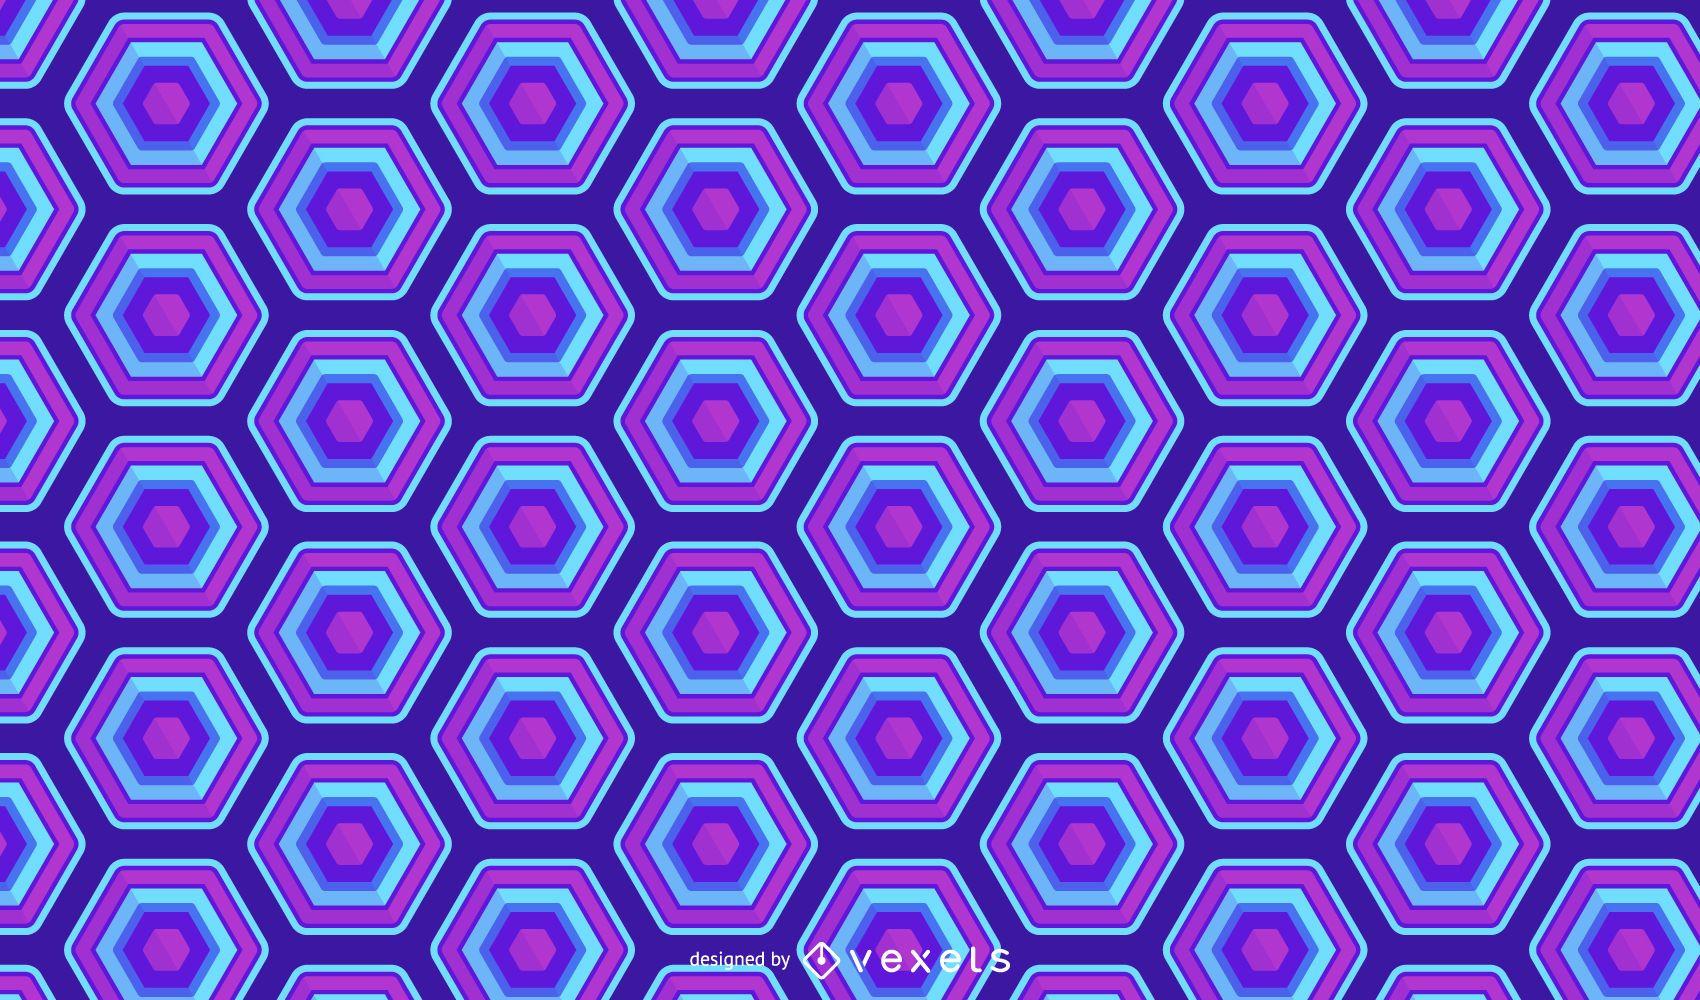 Hexagonal Blue Neon Pattern Design